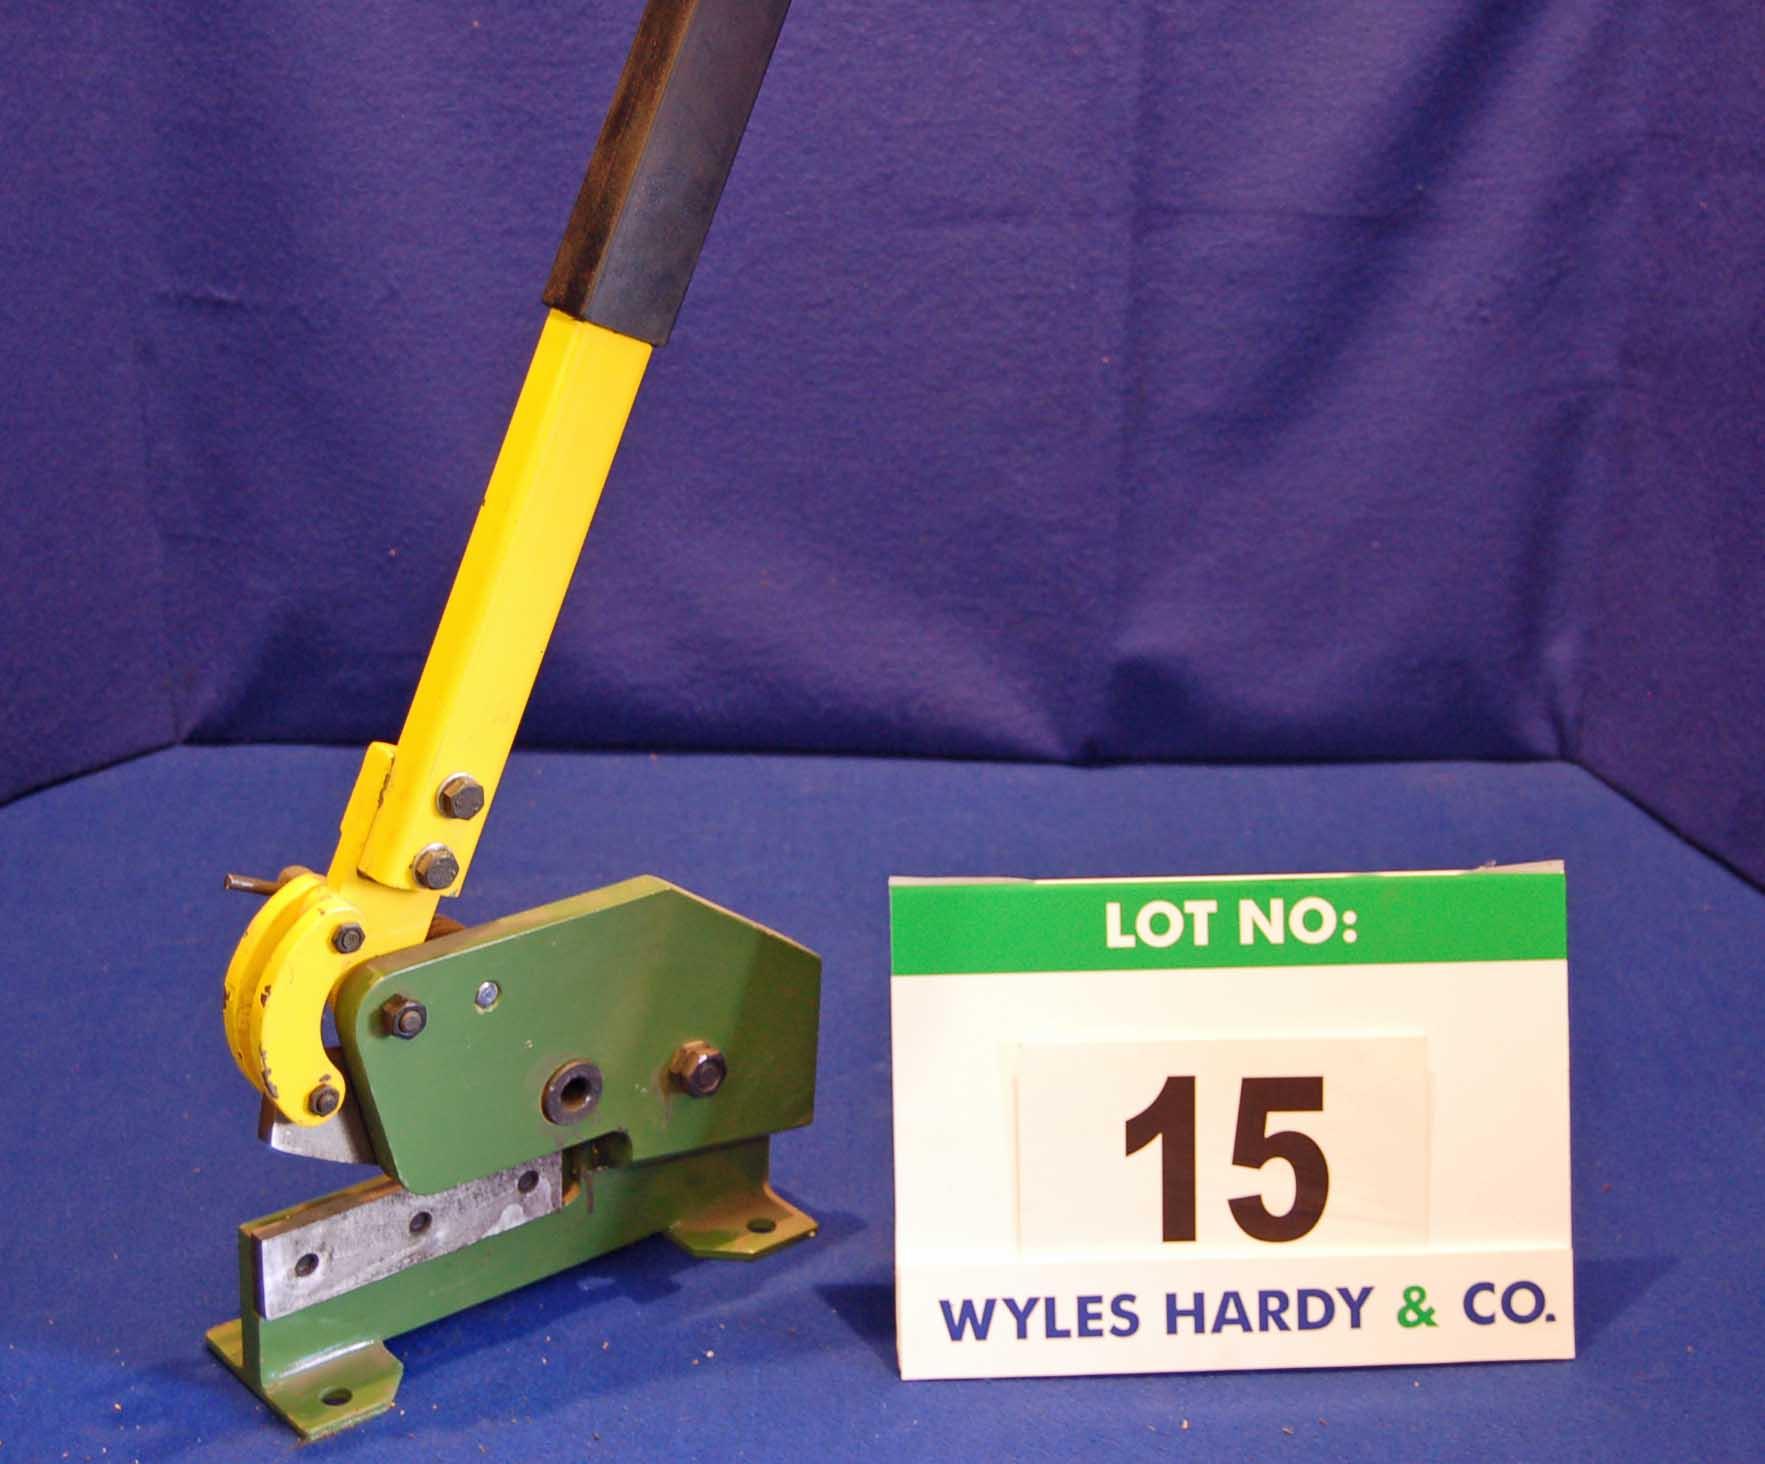 Lot 15 - WARCO Bench mountable Hand Shears